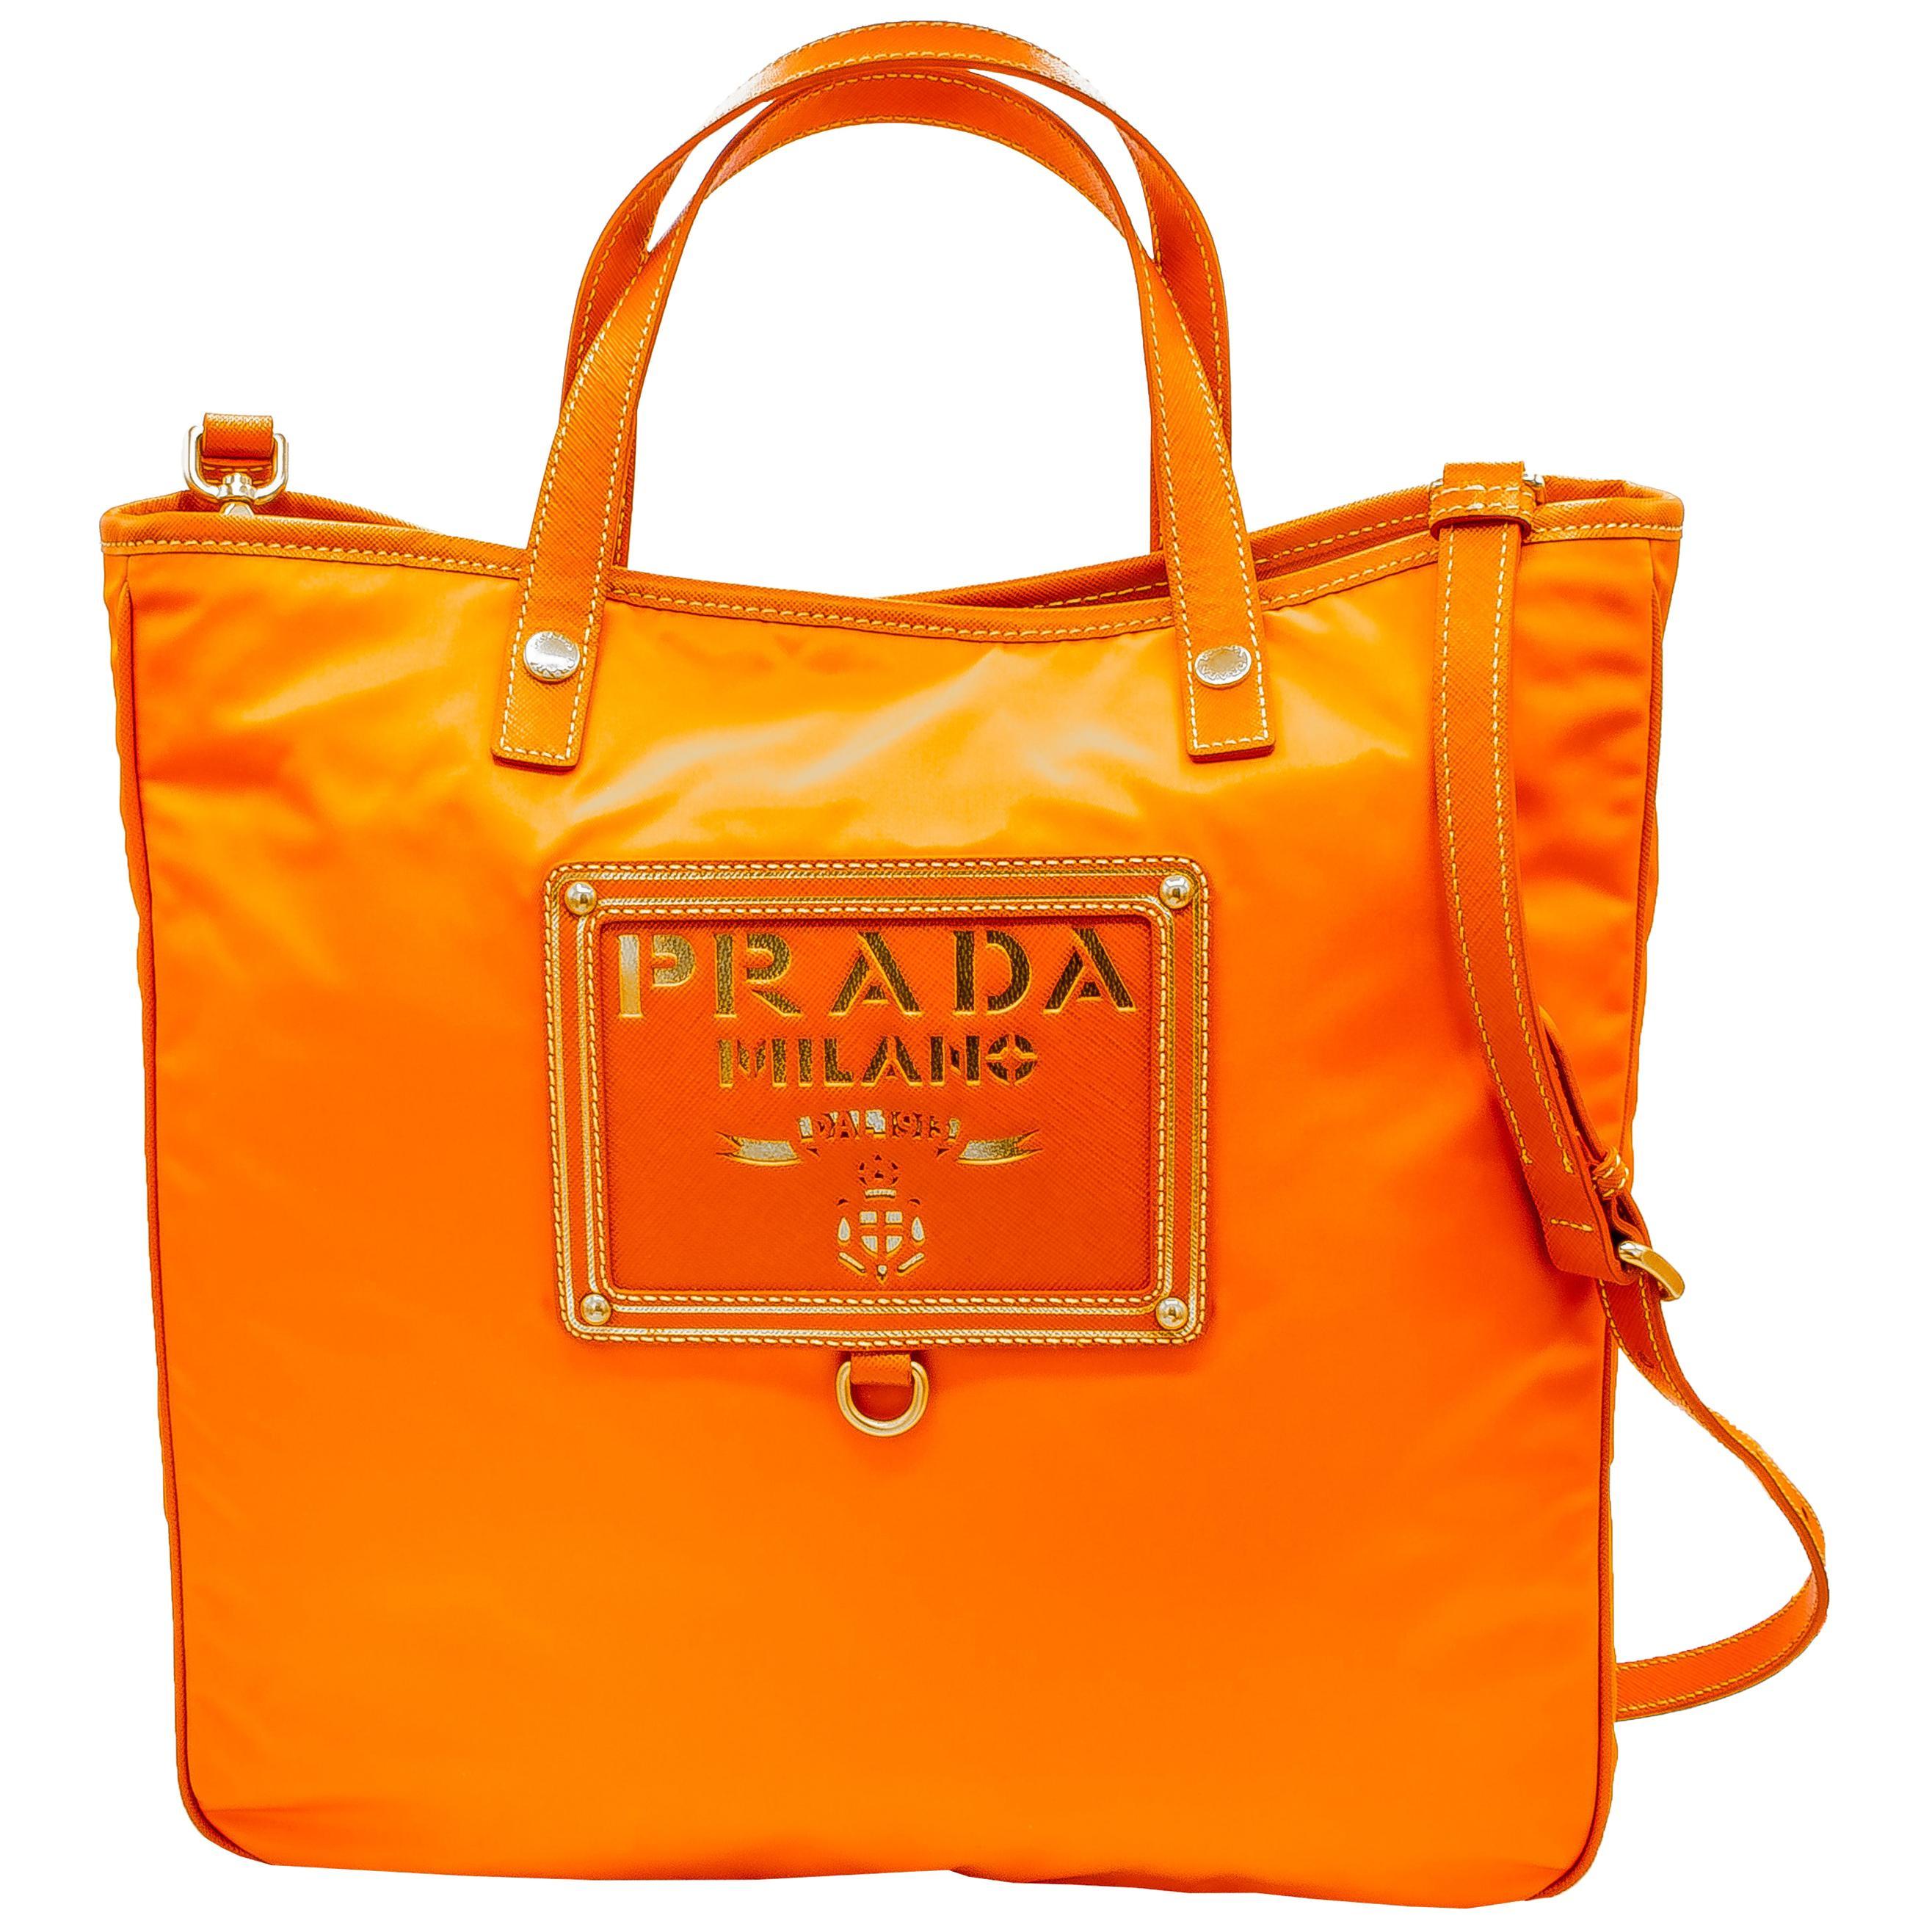 Bright Orange Prada Crossbody Beach Bag